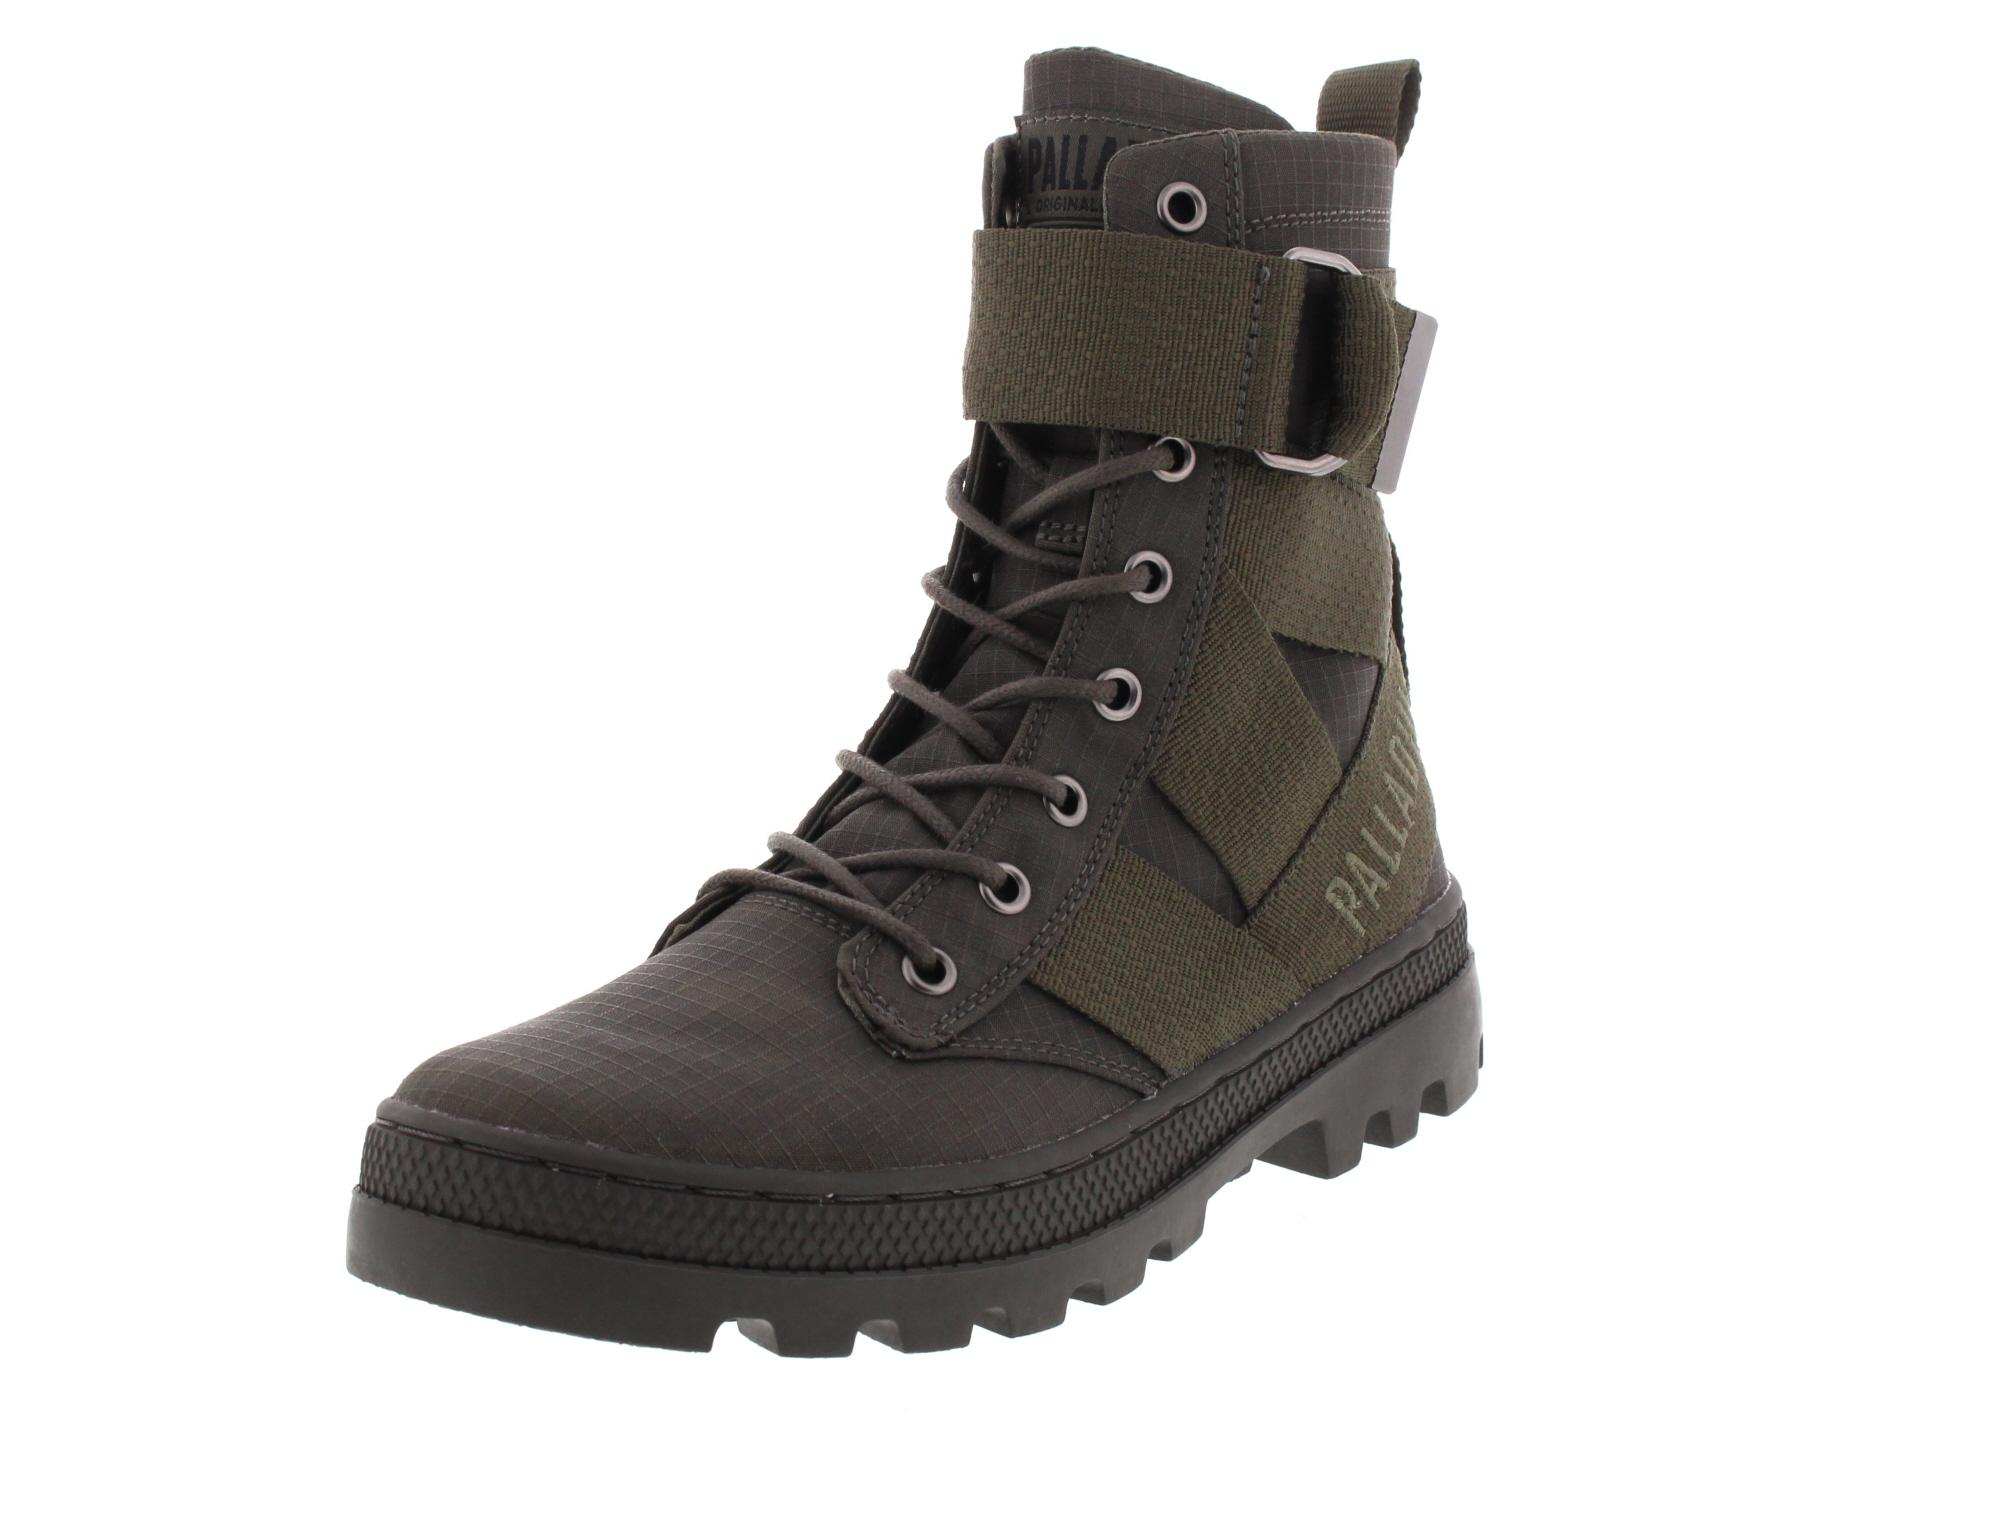 PALLADIUM Damen - Boots PALLABOSSE TACT ST TX - olive 0-6821